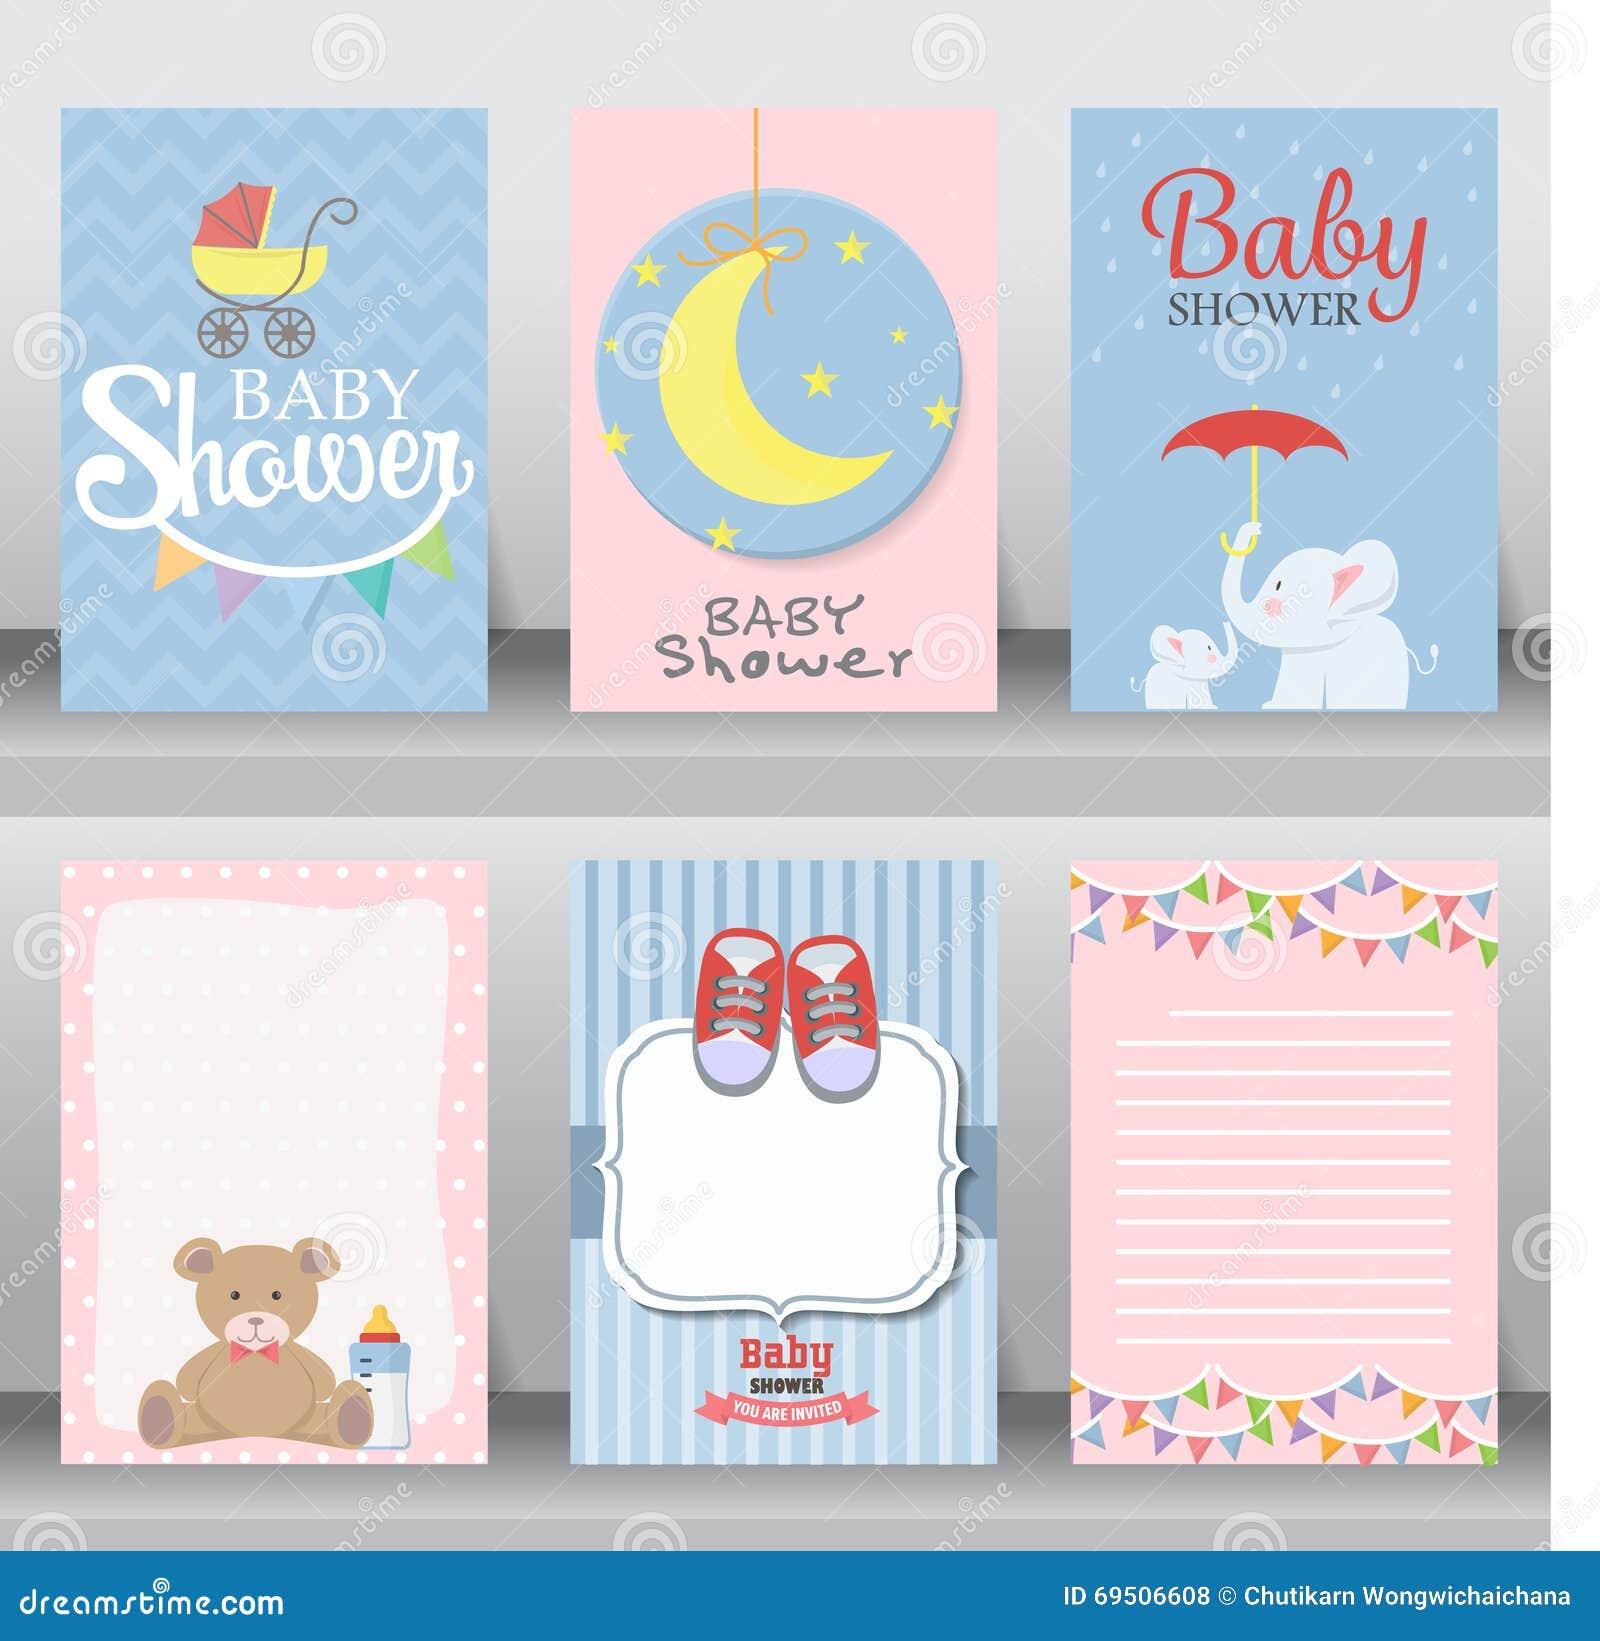 Baby shower invitation card. vector